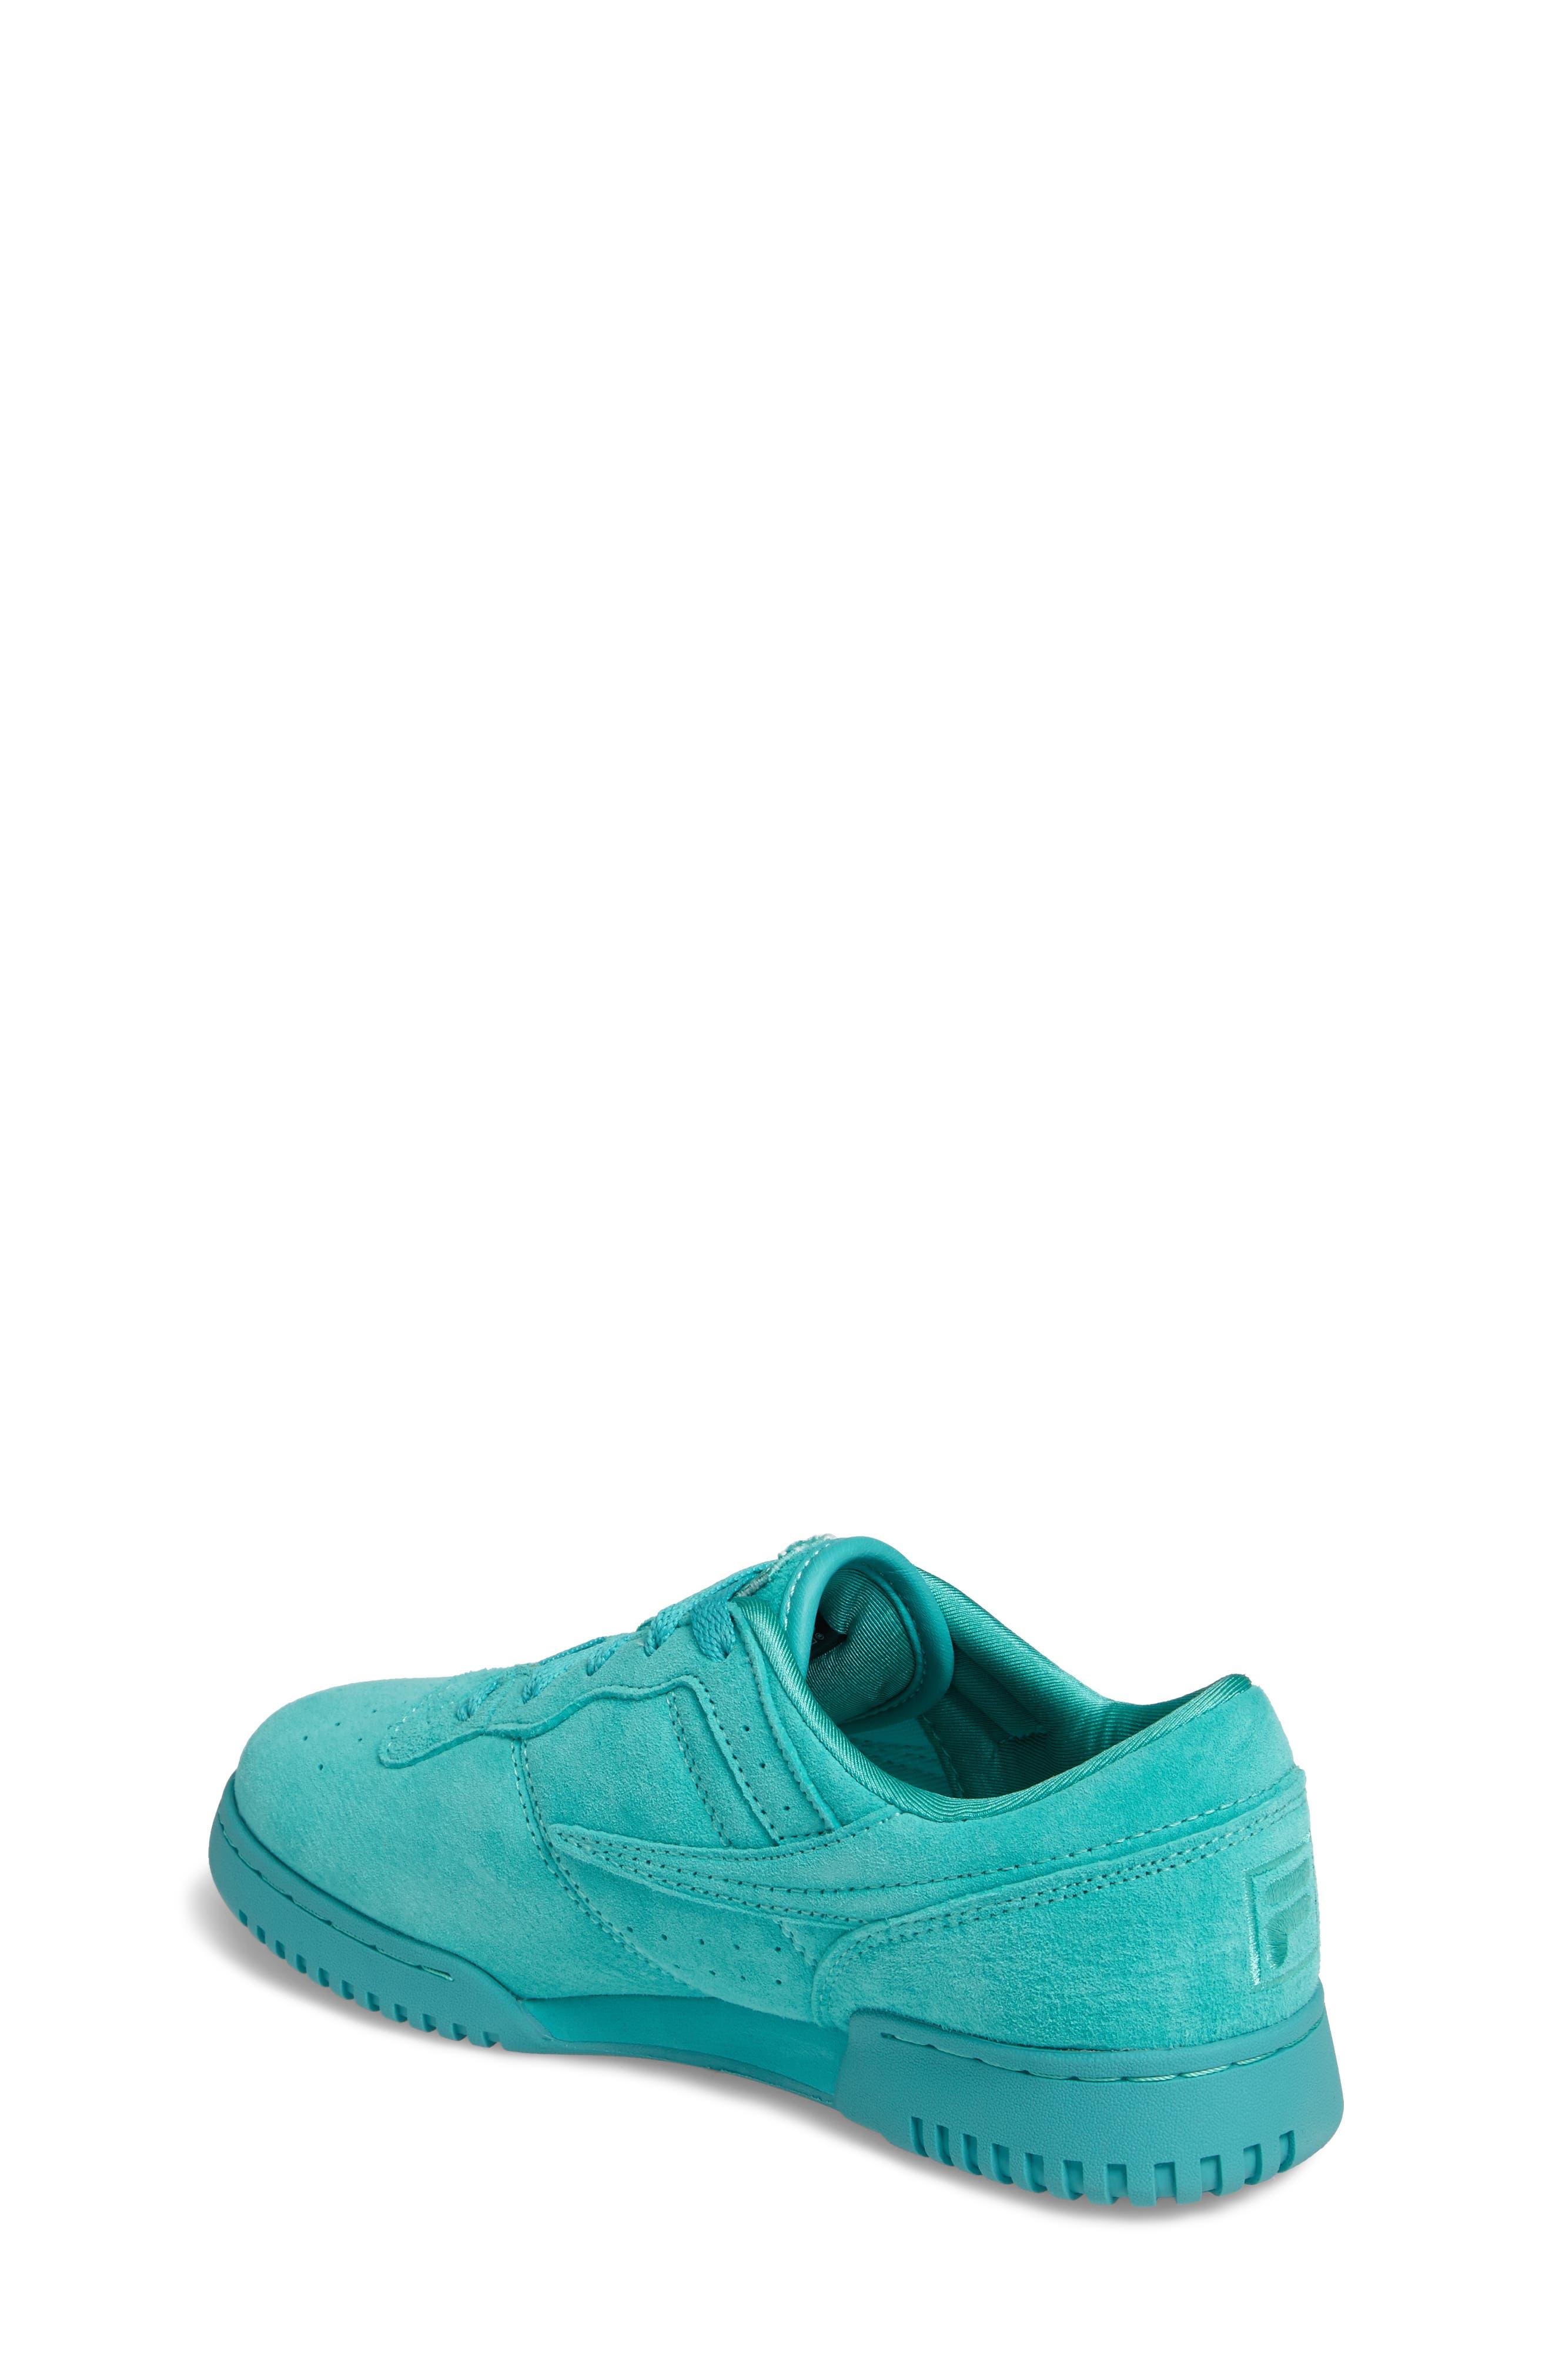 Original Fitness Sneaker,                             Alternate thumbnail 2, color,                             Sea Foam